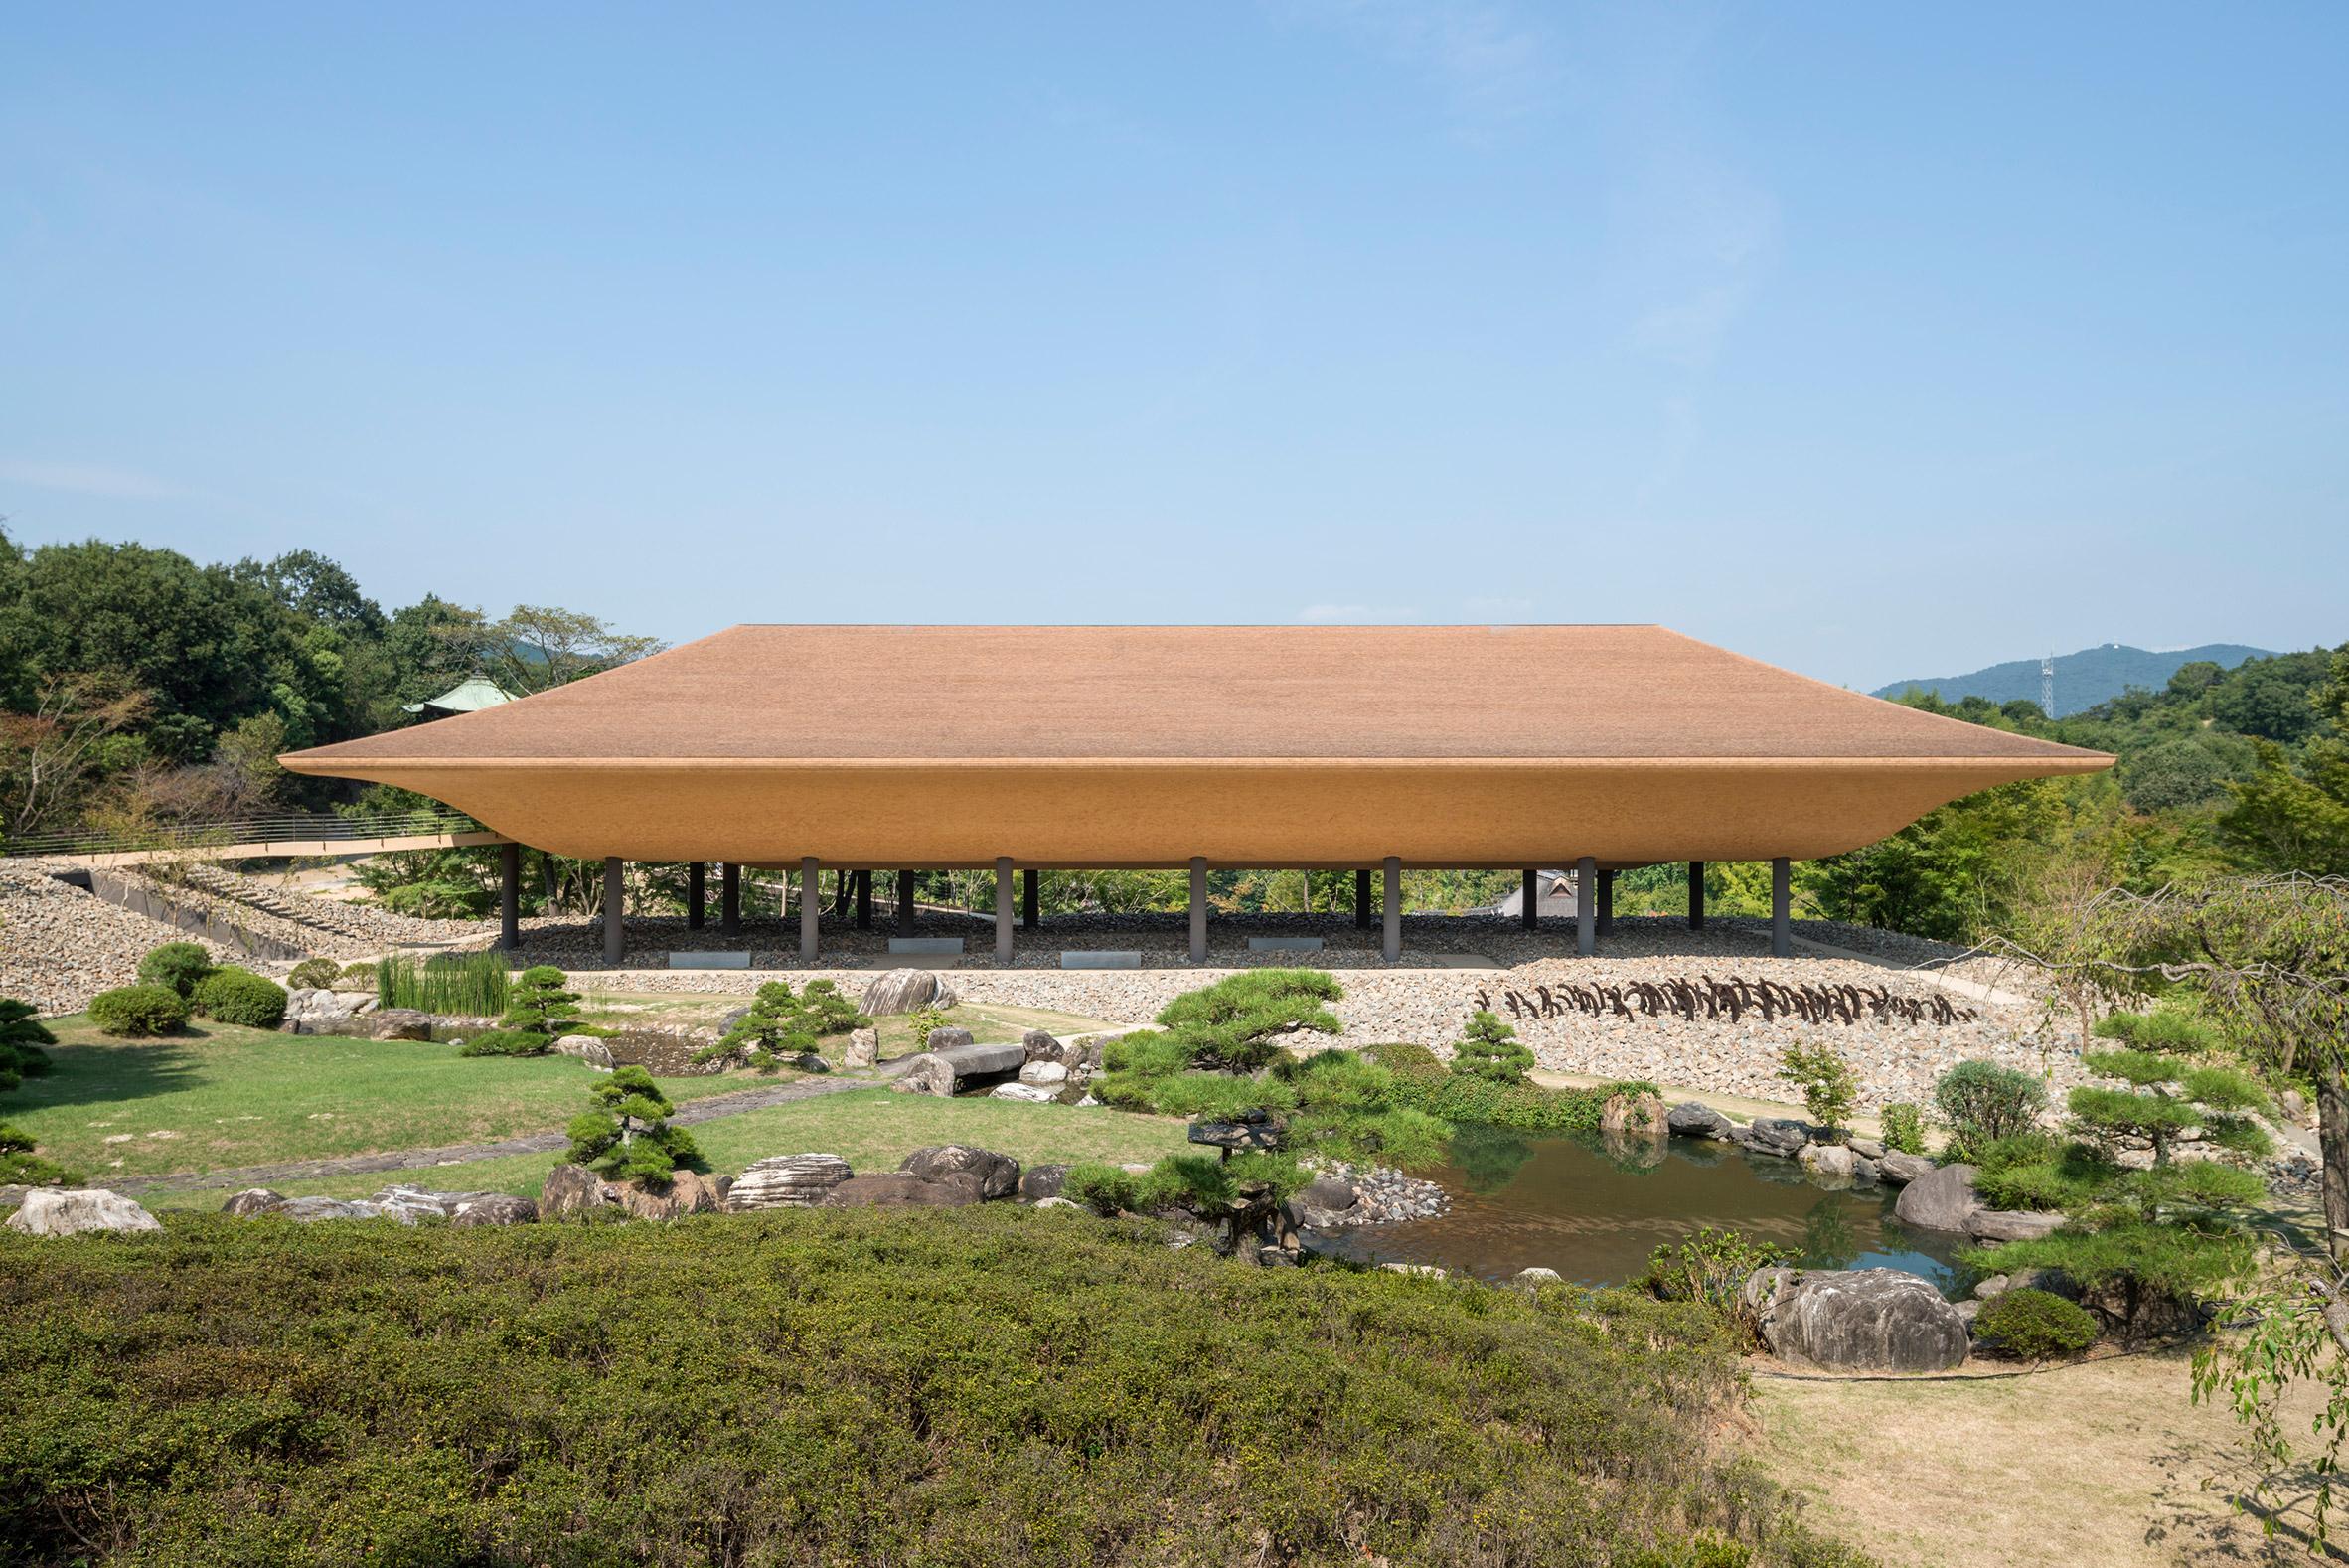 Shinshoji Zen Museum pavilion by Kohei Nawa and Sandwich studio